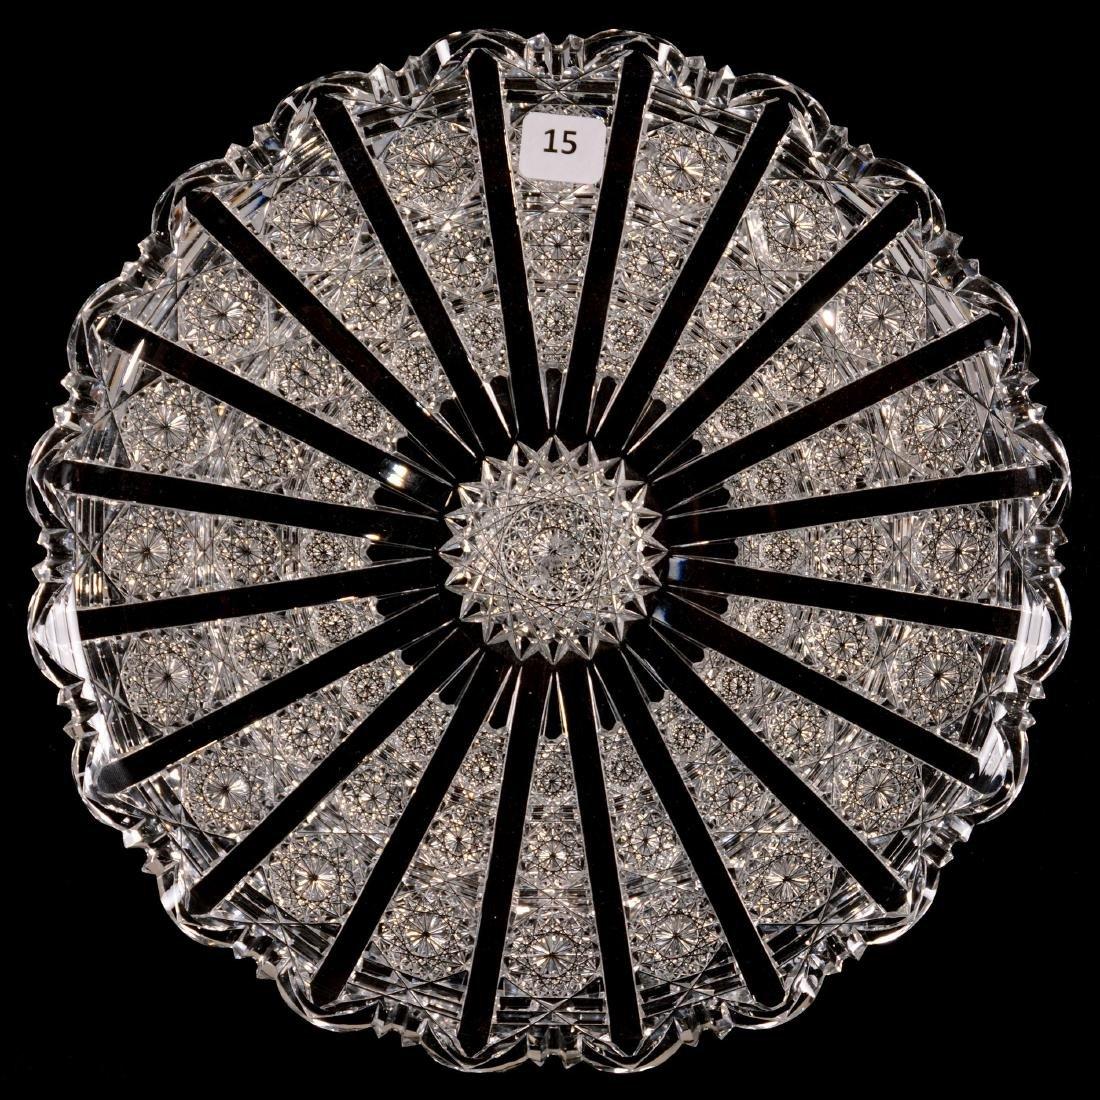 Round Tray - BPCG